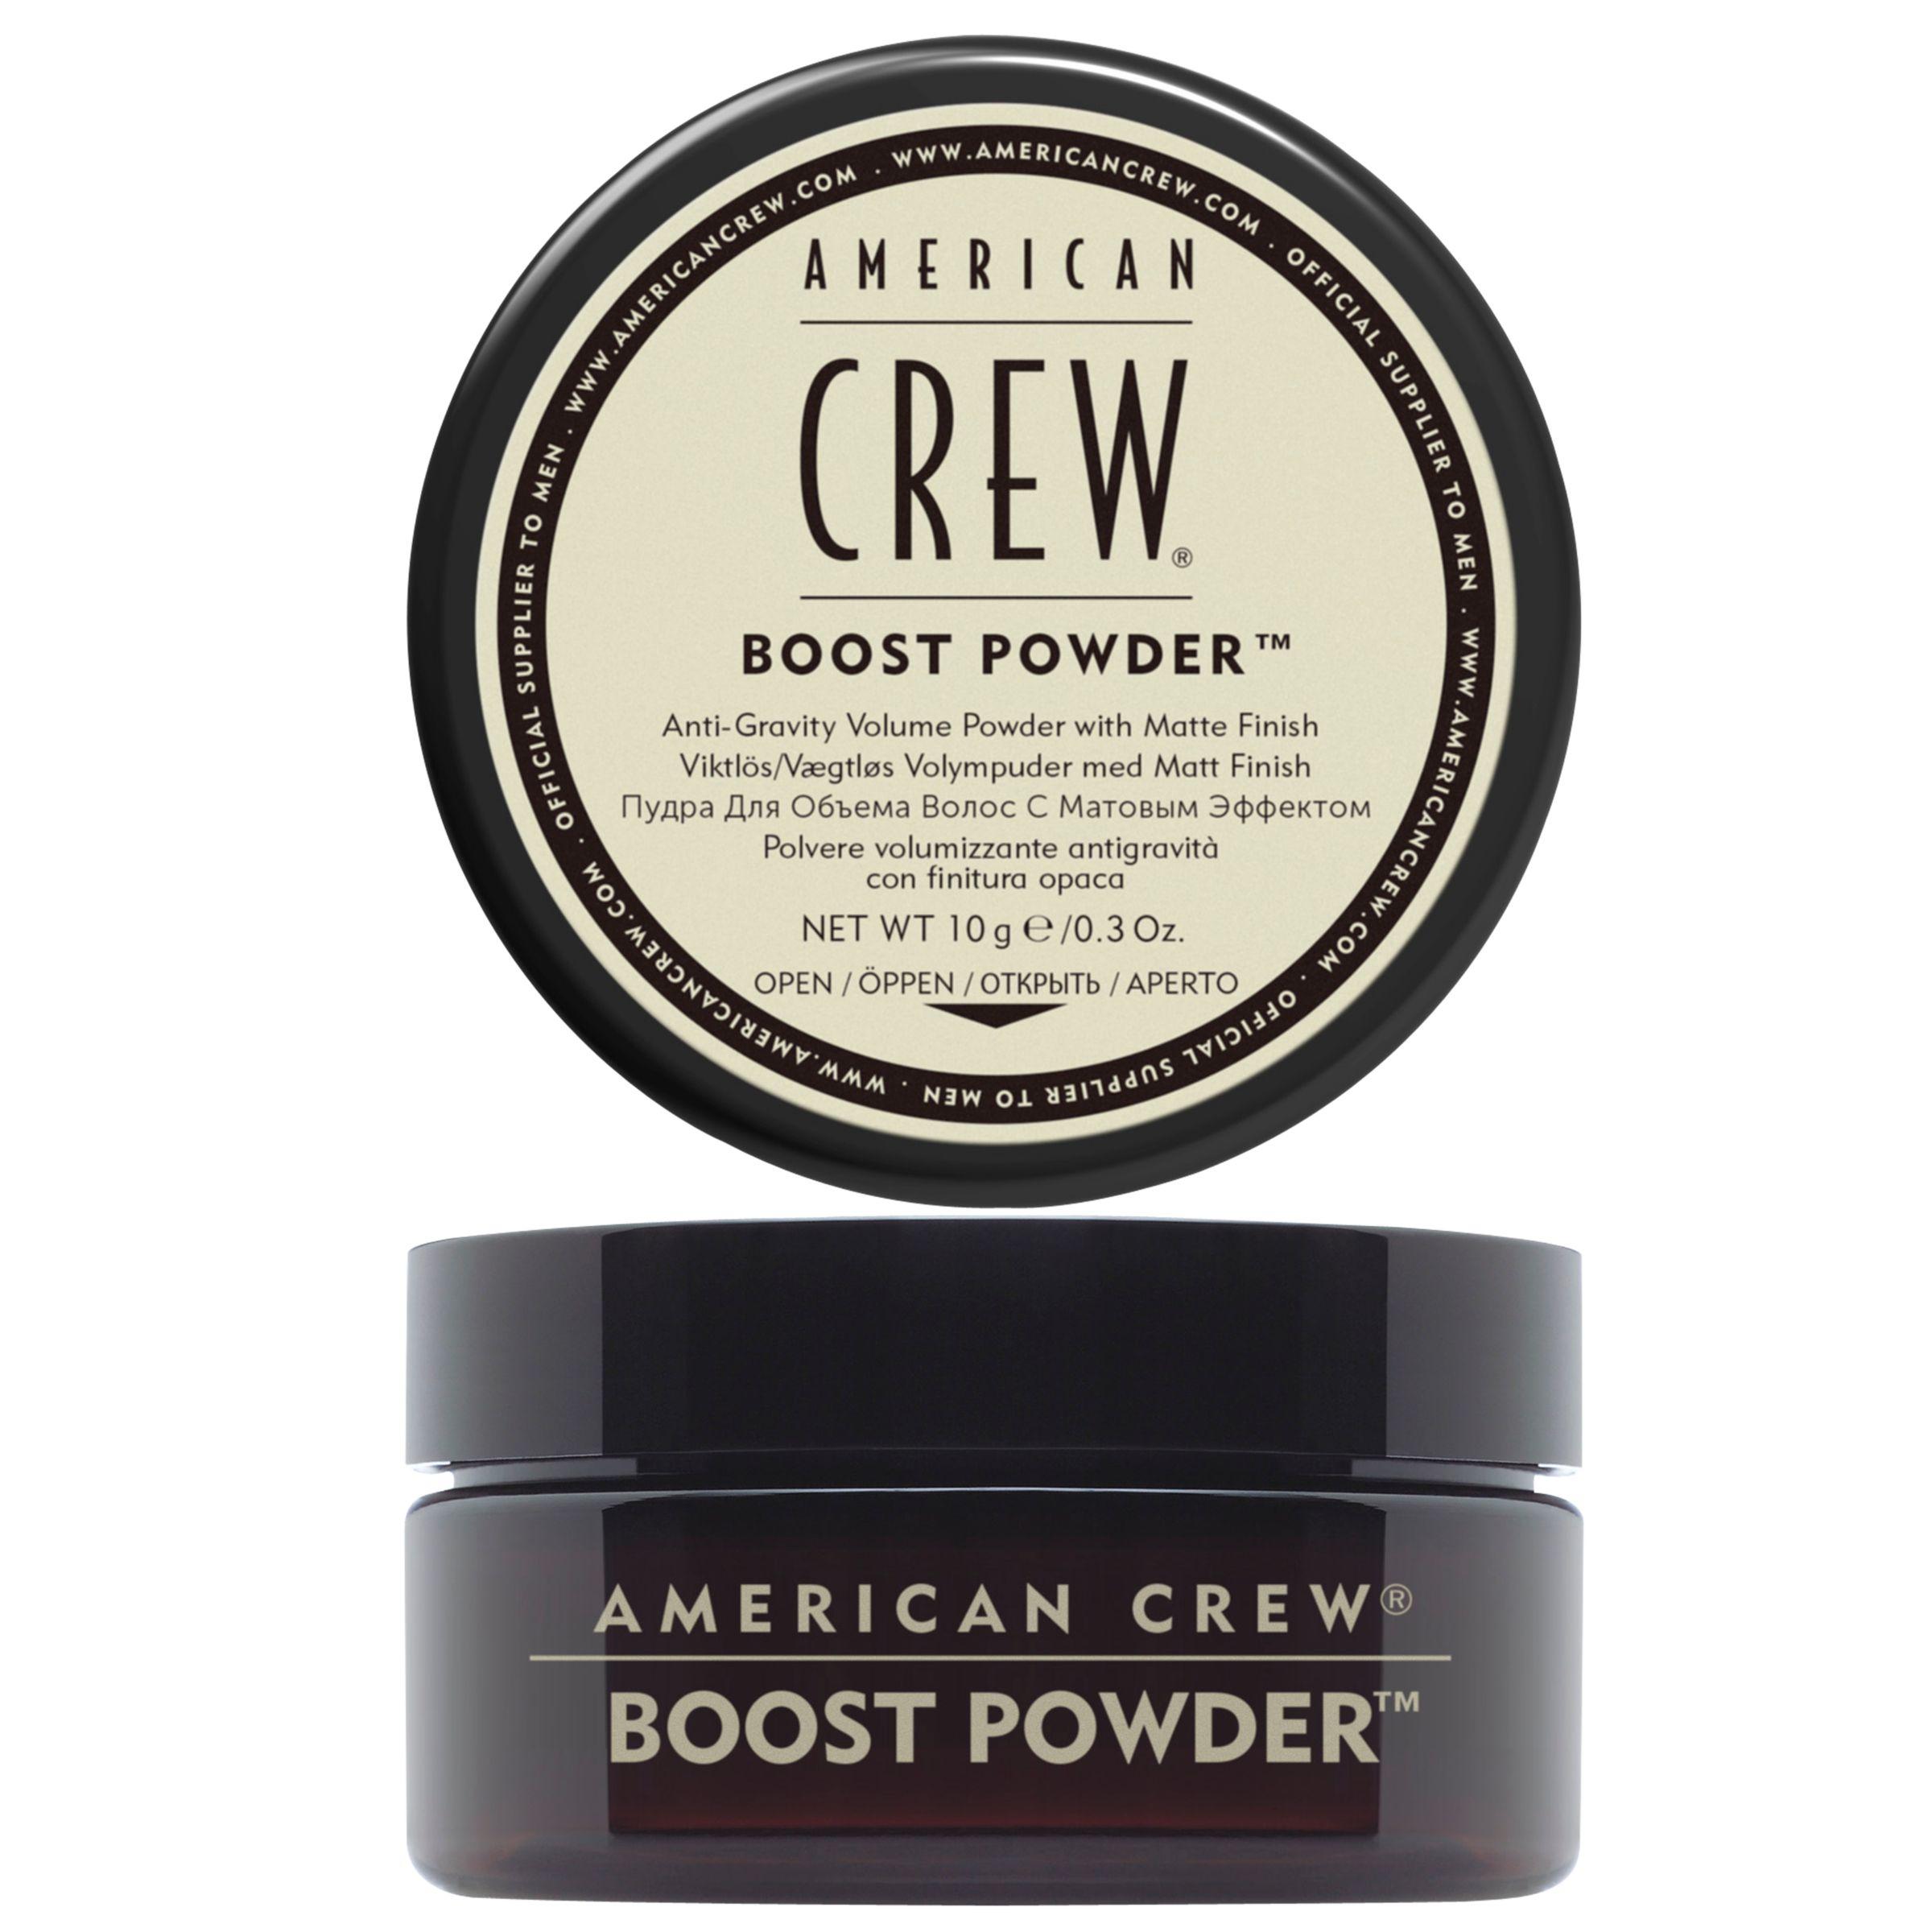 American Crew American Crew Boost Powder, 10g